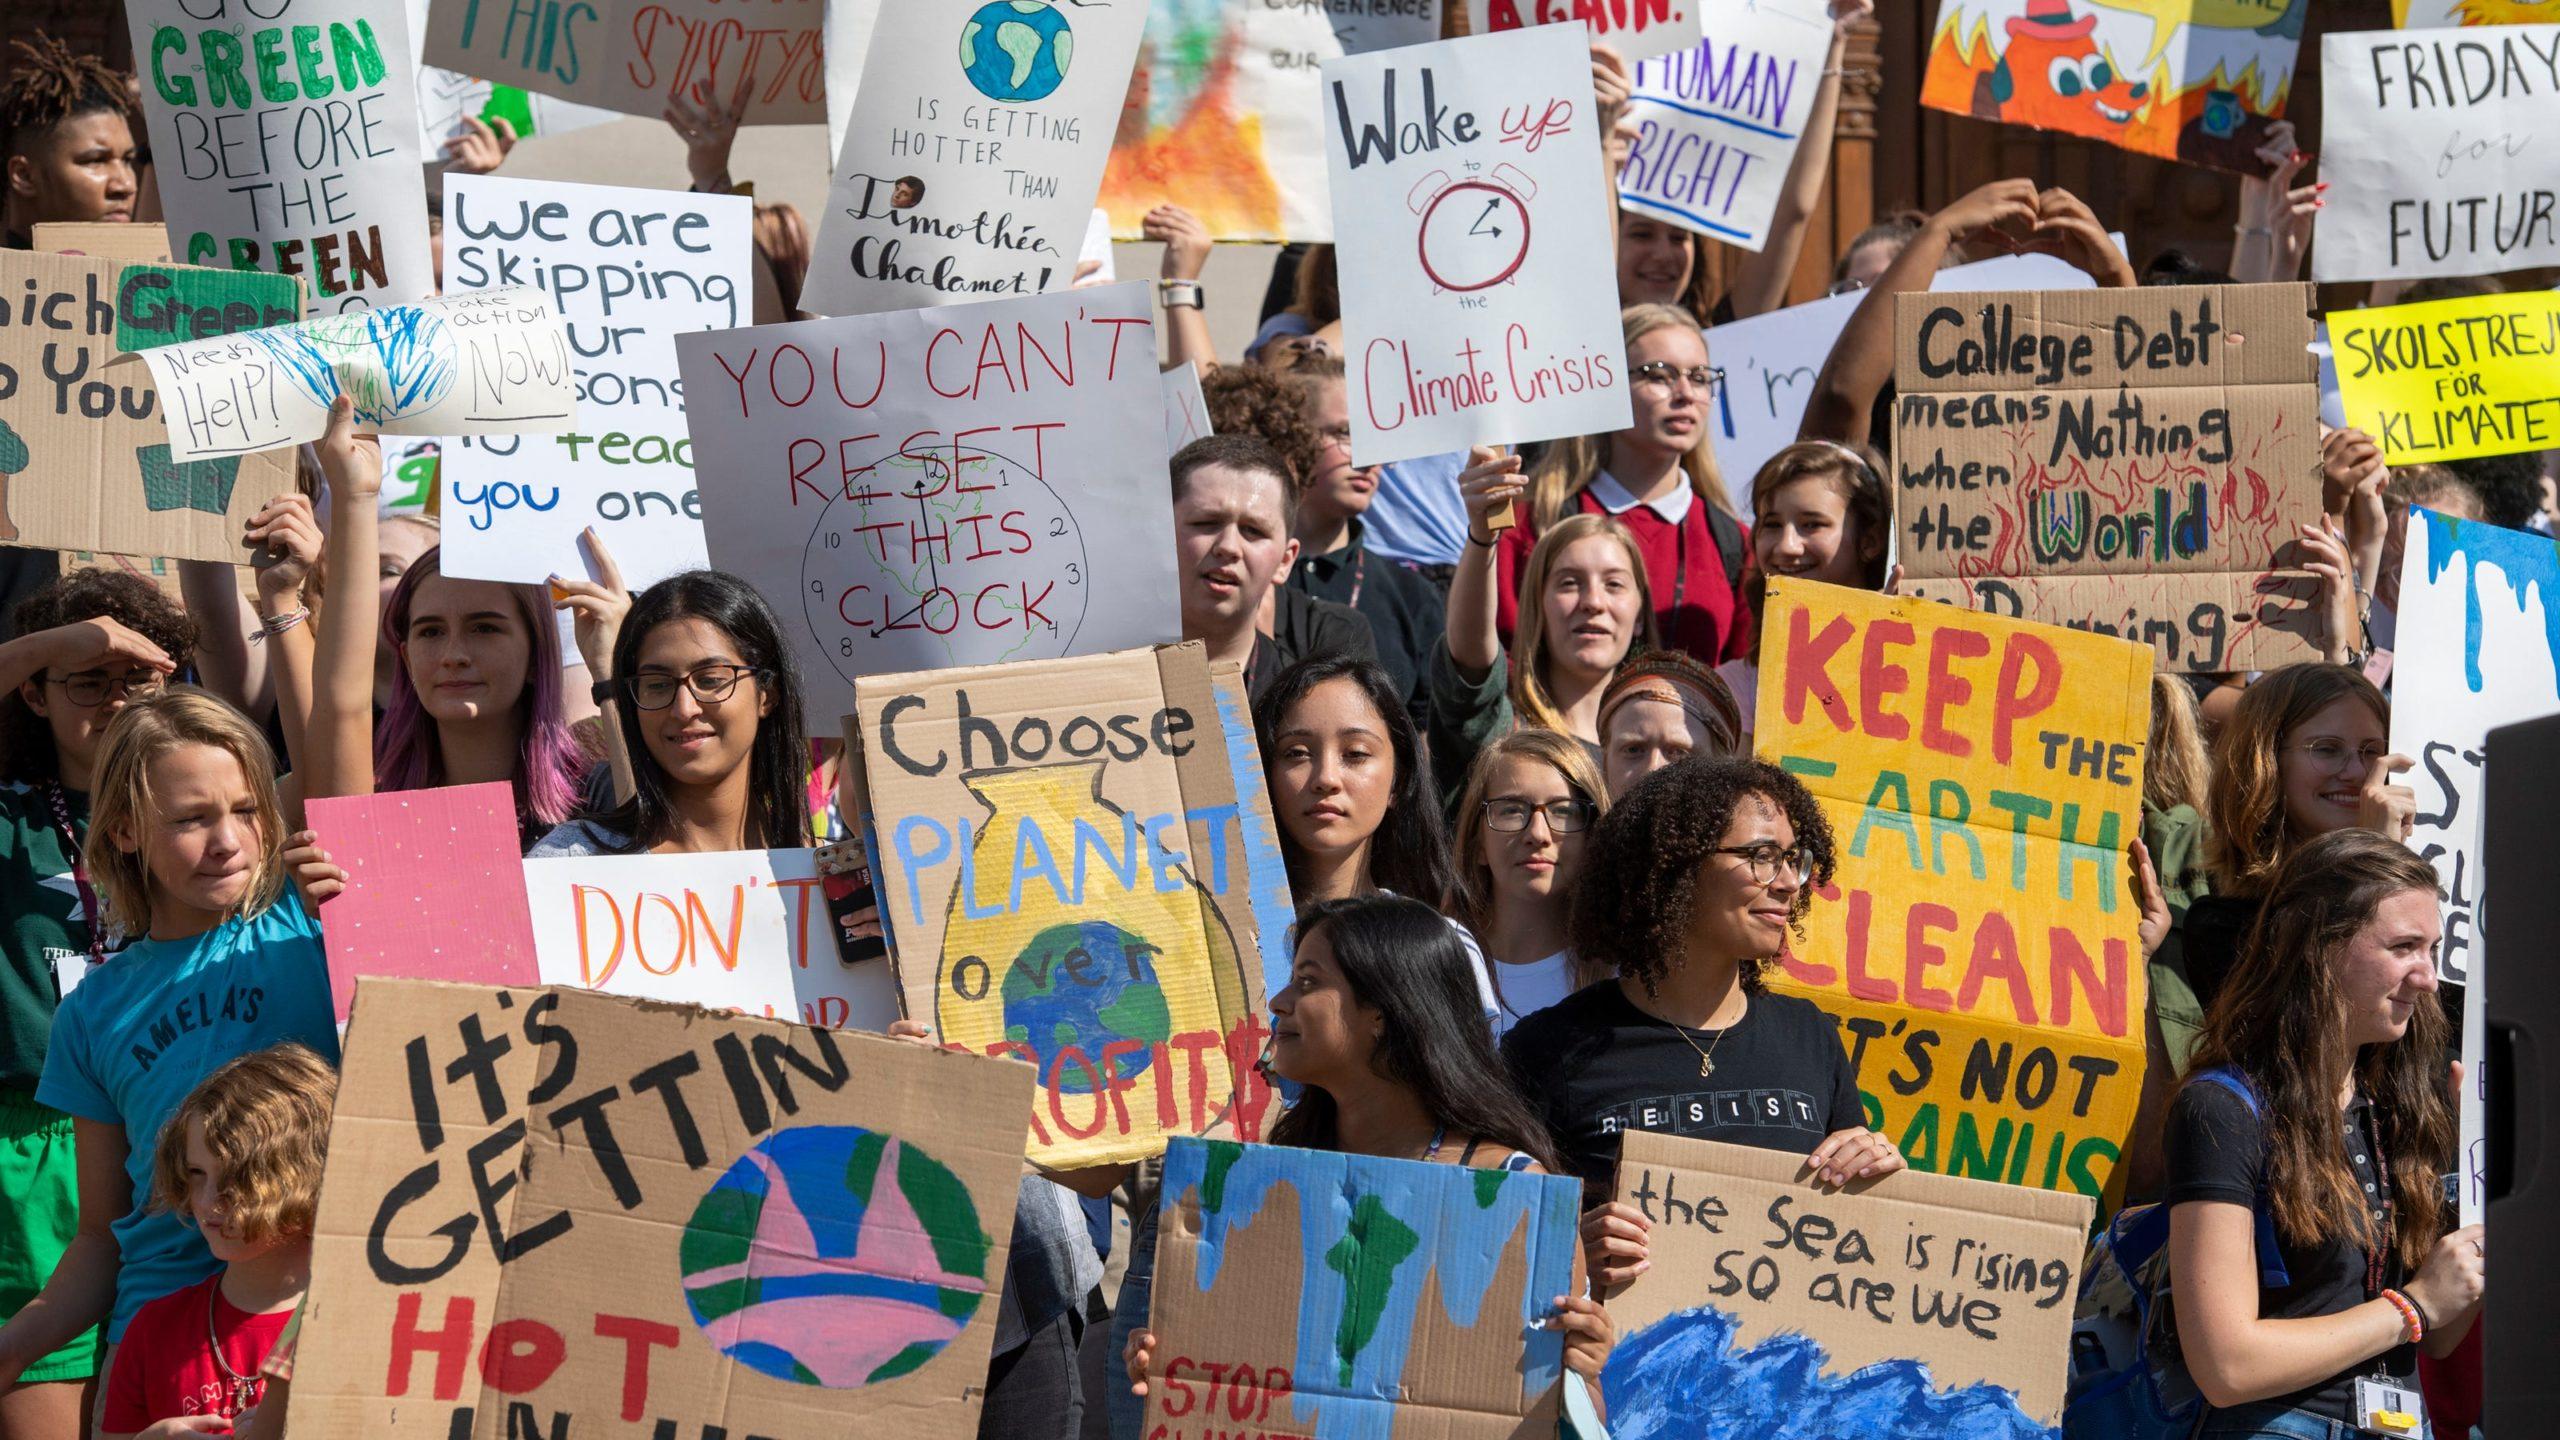 Klimaatrapport IPCC klimaatcrisis urgentie